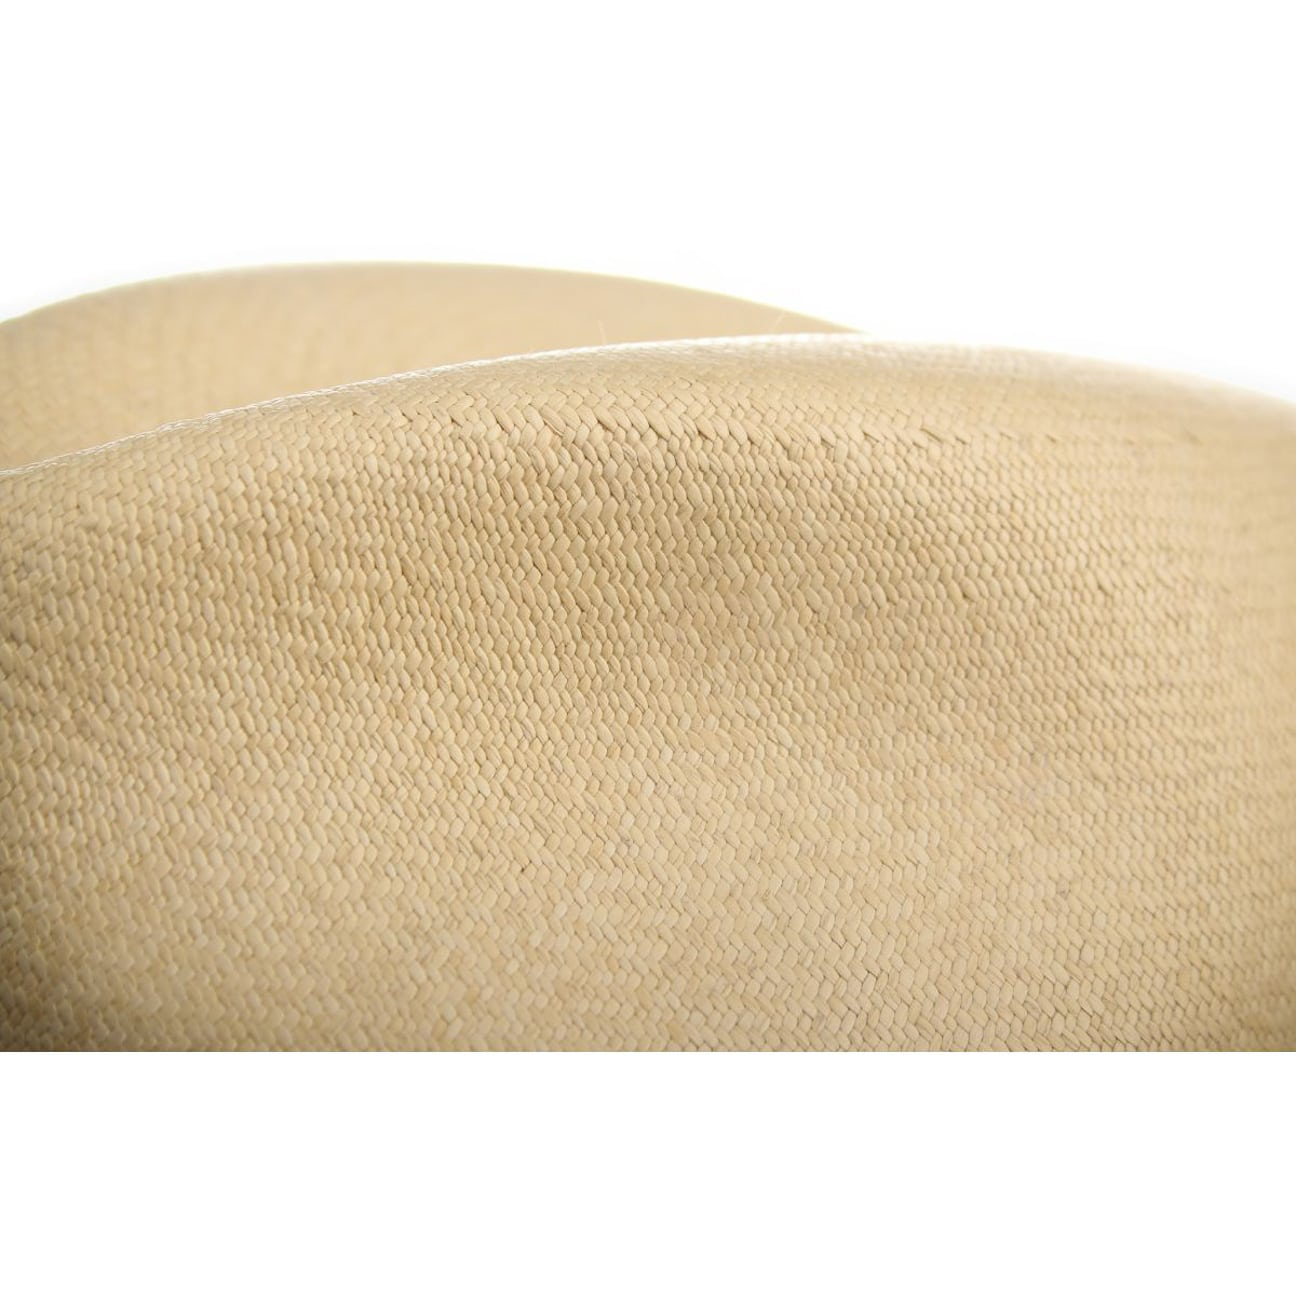 Cappello Panama Prestige Bogart by Borsalino - 1499 740a5a9d9056